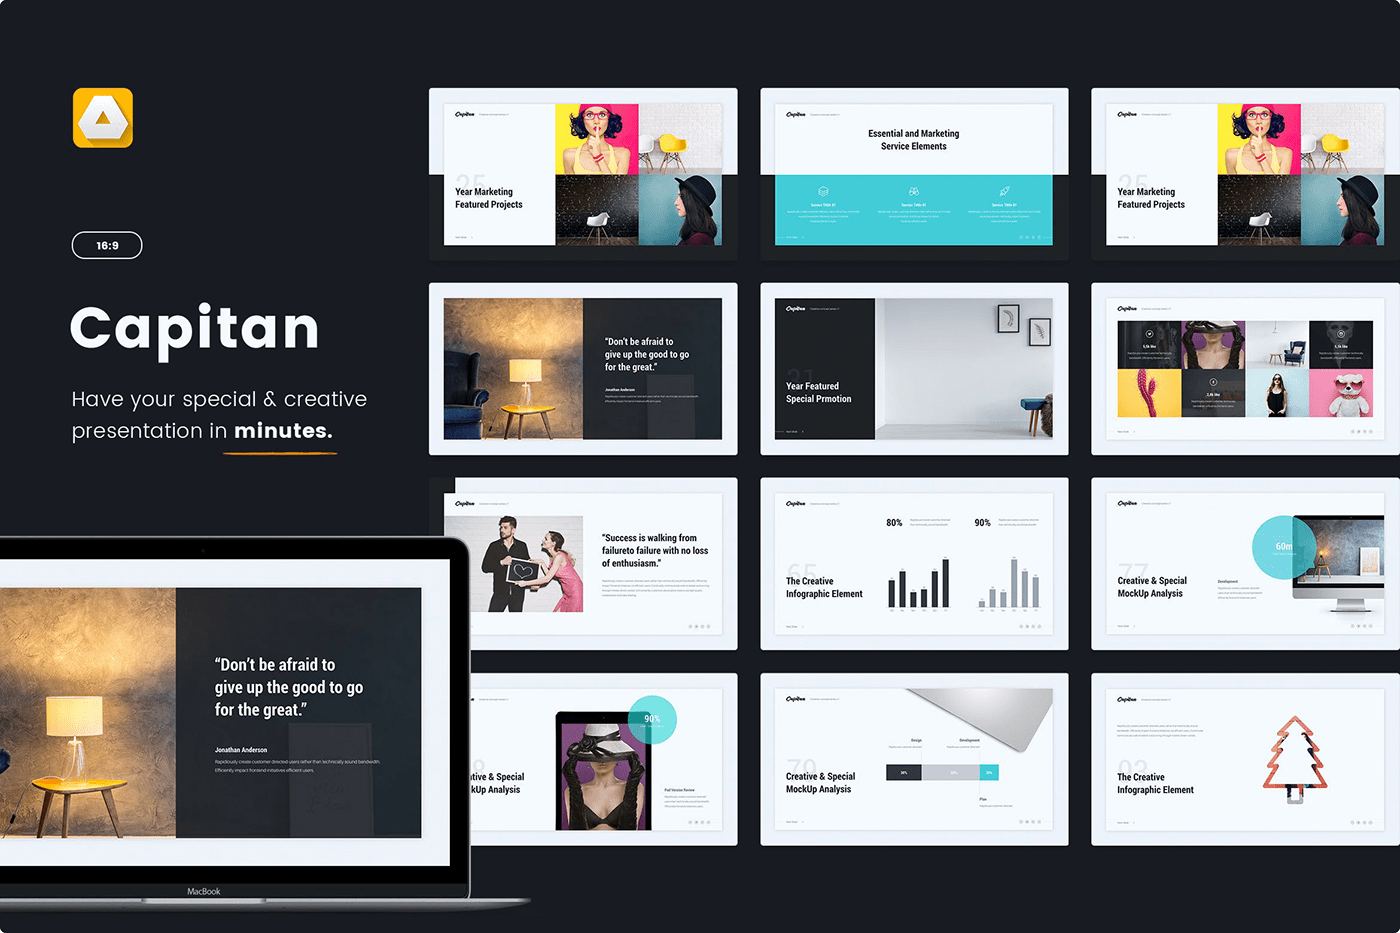 Notify - Animated & Creative Presentation Template (KEY) - 5